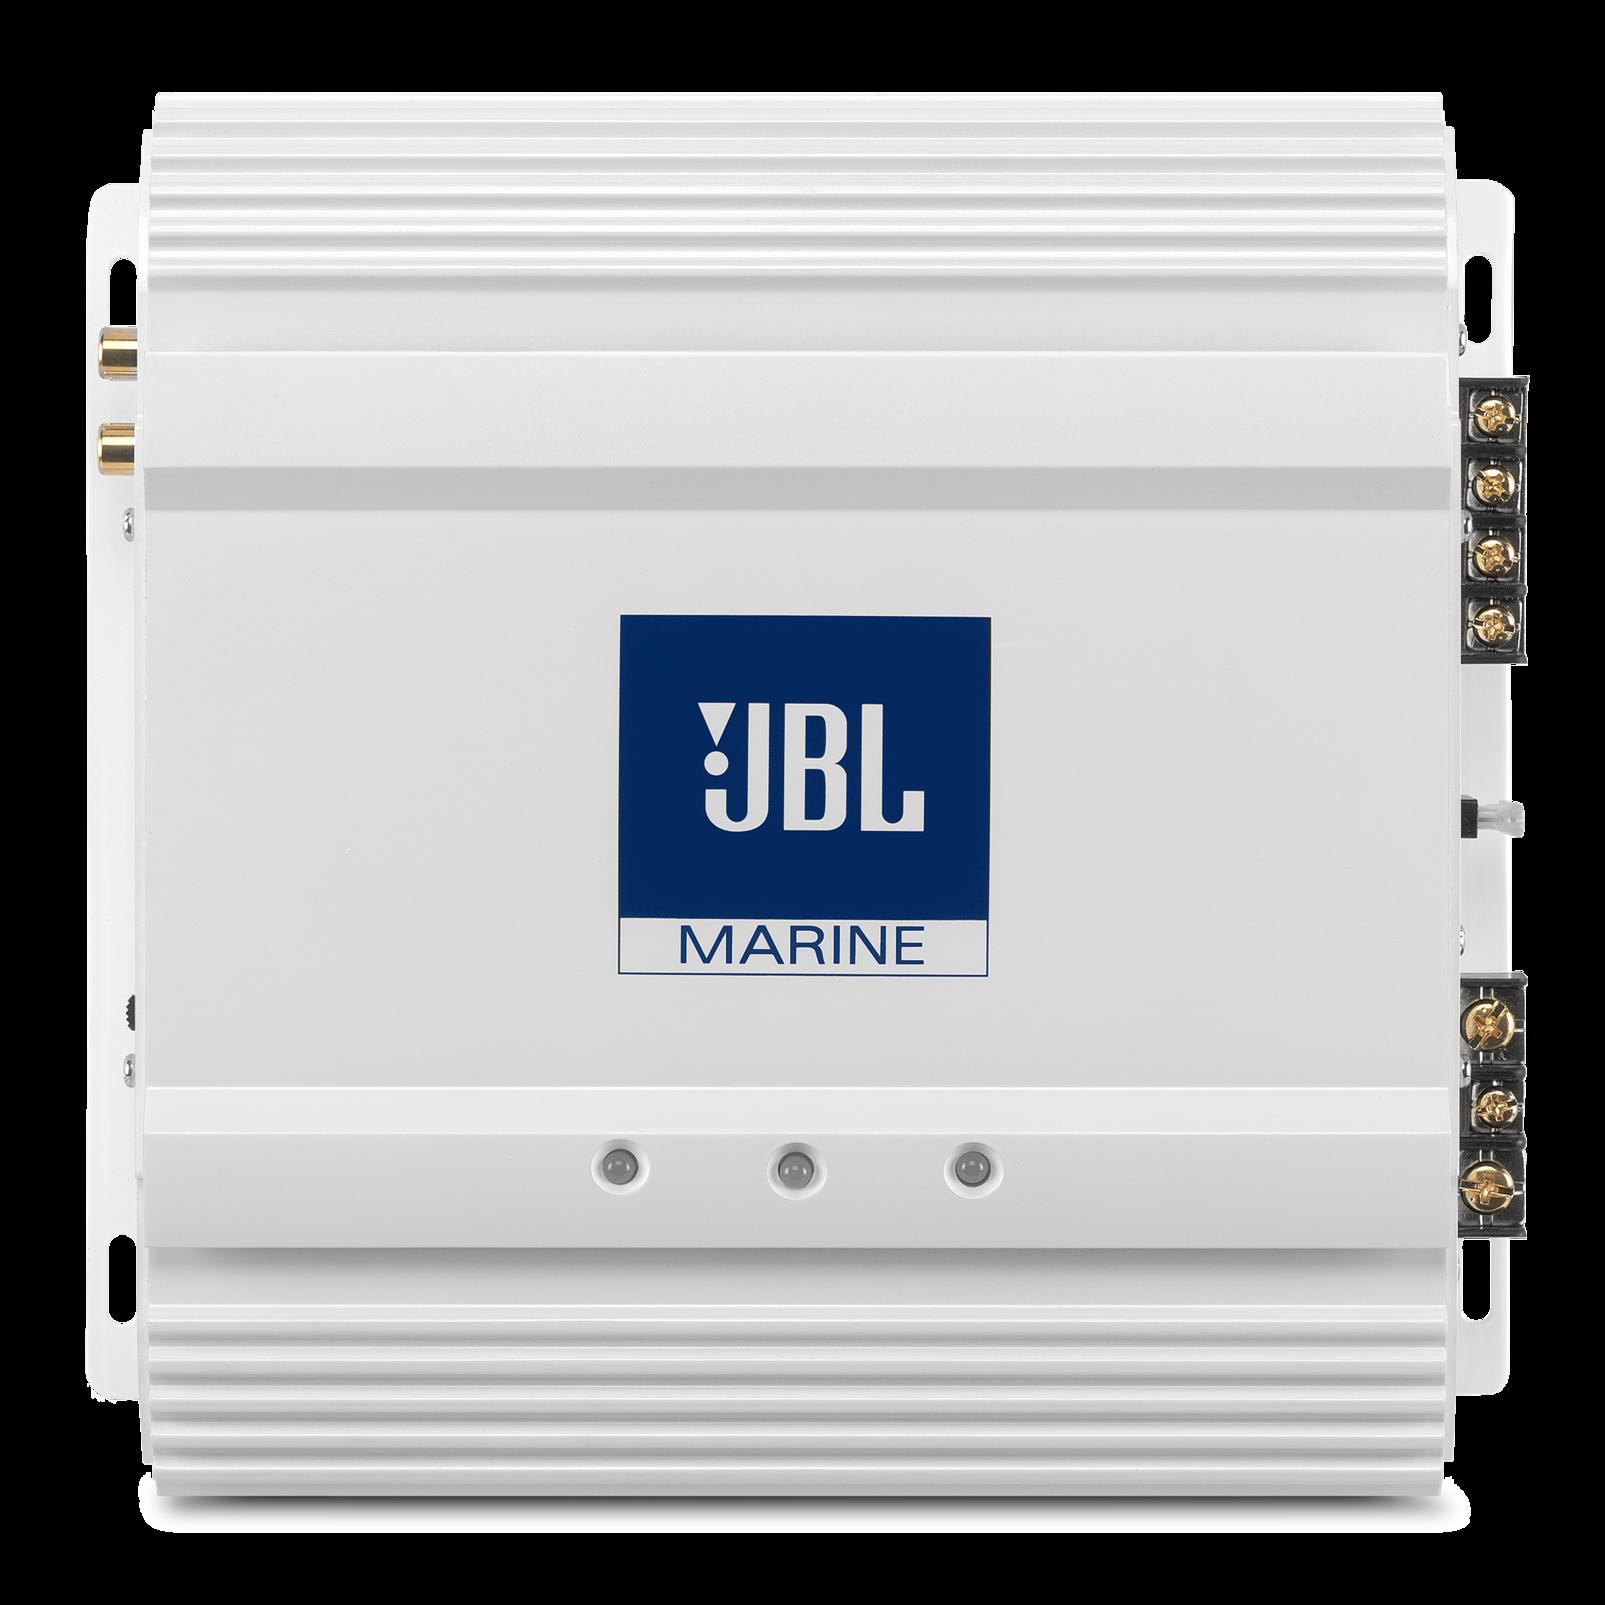 Ma6002 Durable 160 Watt 2 Channel Marine Boat Amplifier Chargecompensatedsampleandhold Amplifiercircuit Circuit